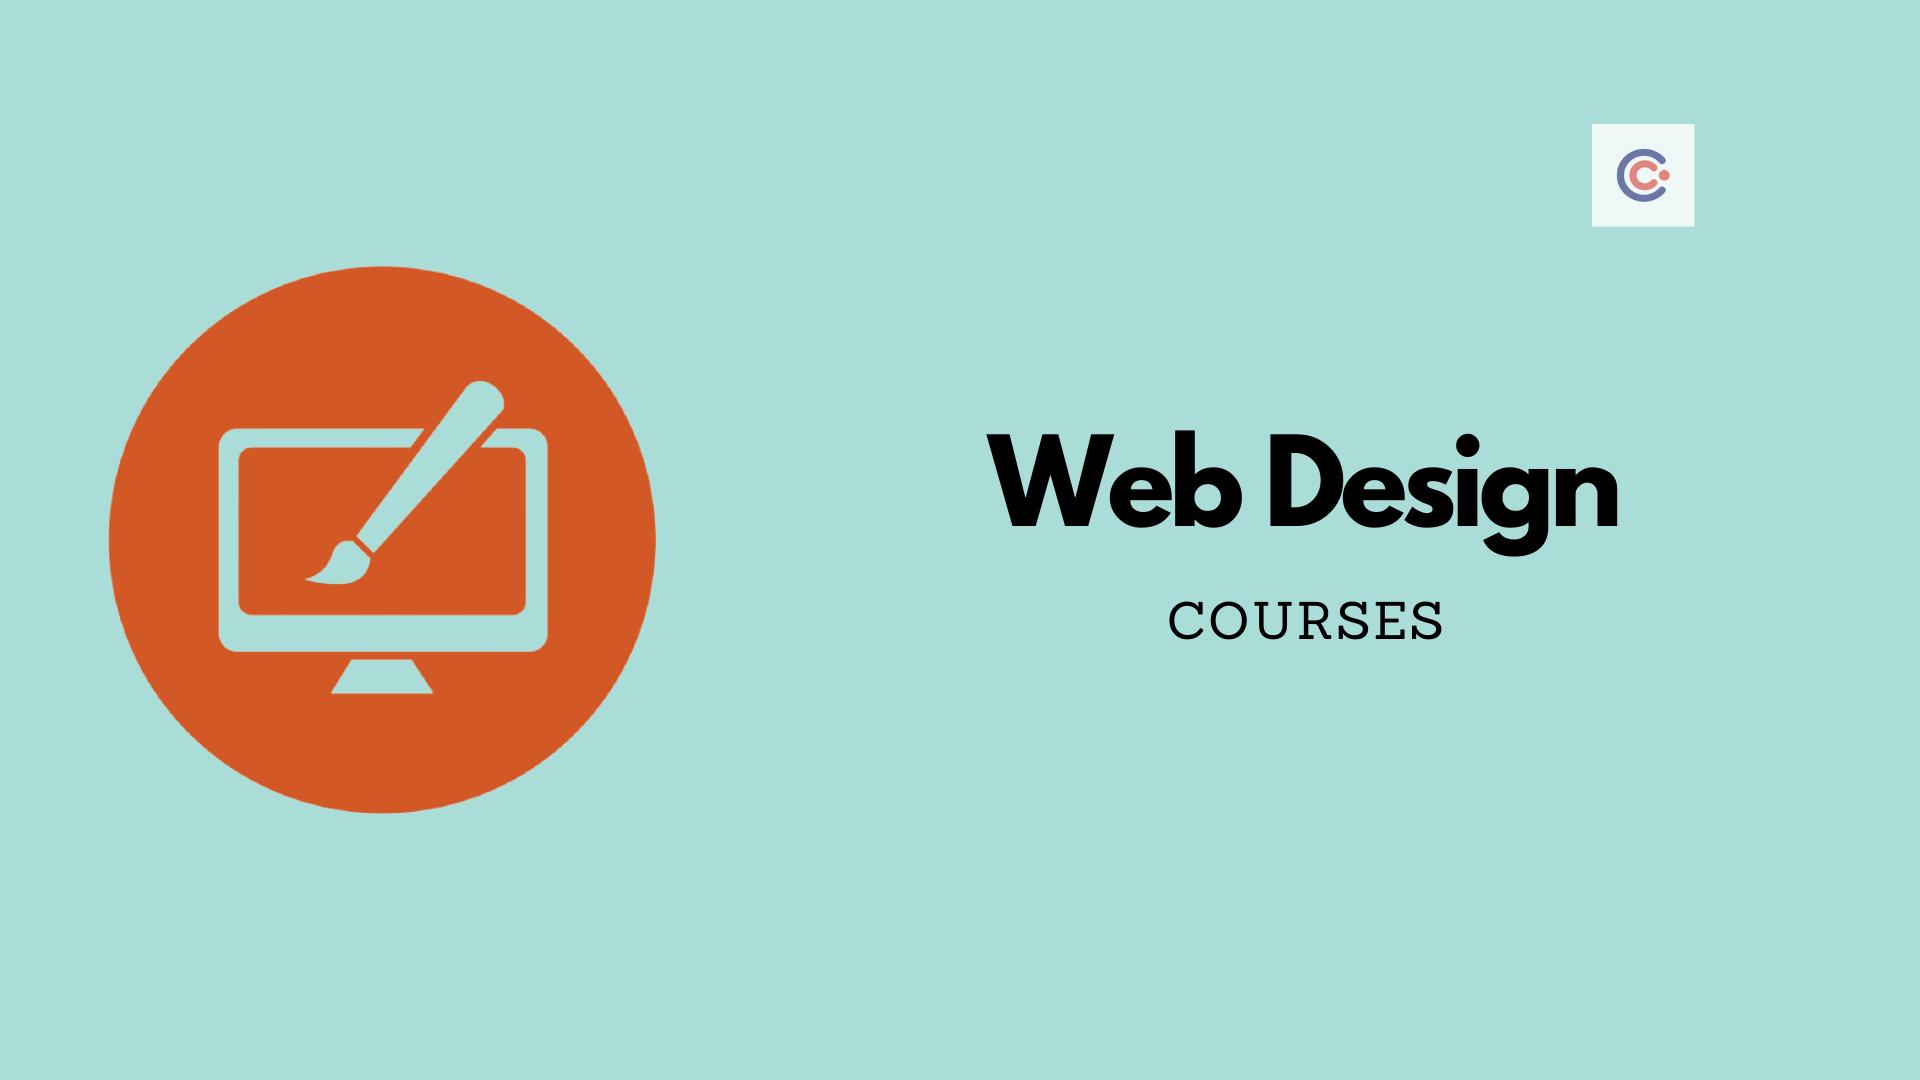 10 Best Web Design Courses - Learn Web Designing Online